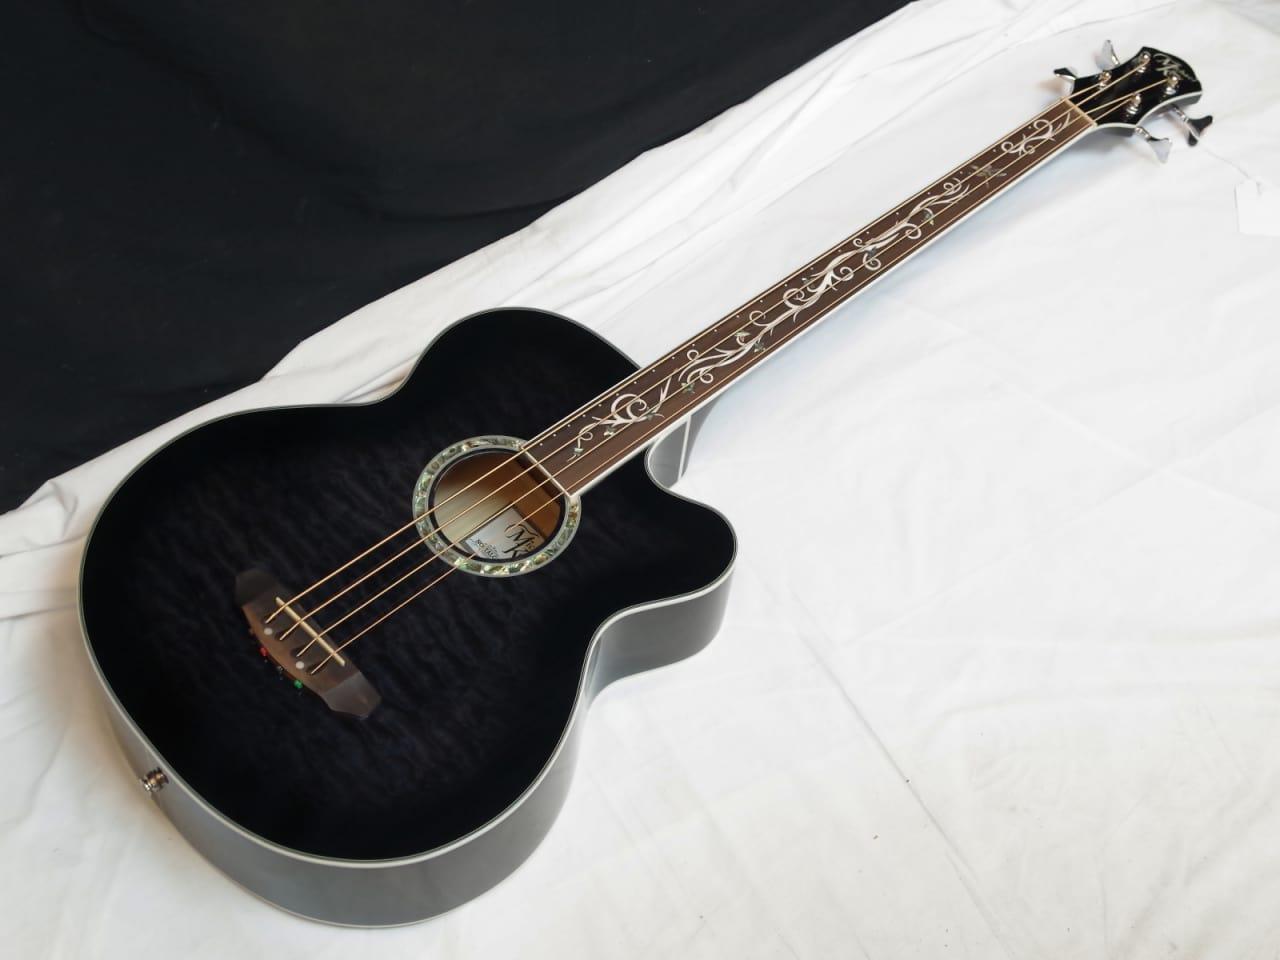 michael kelly dragonfly 4 string fretless acoustic bass reverb. Black Bedroom Furniture Sets. Home Design Ideas